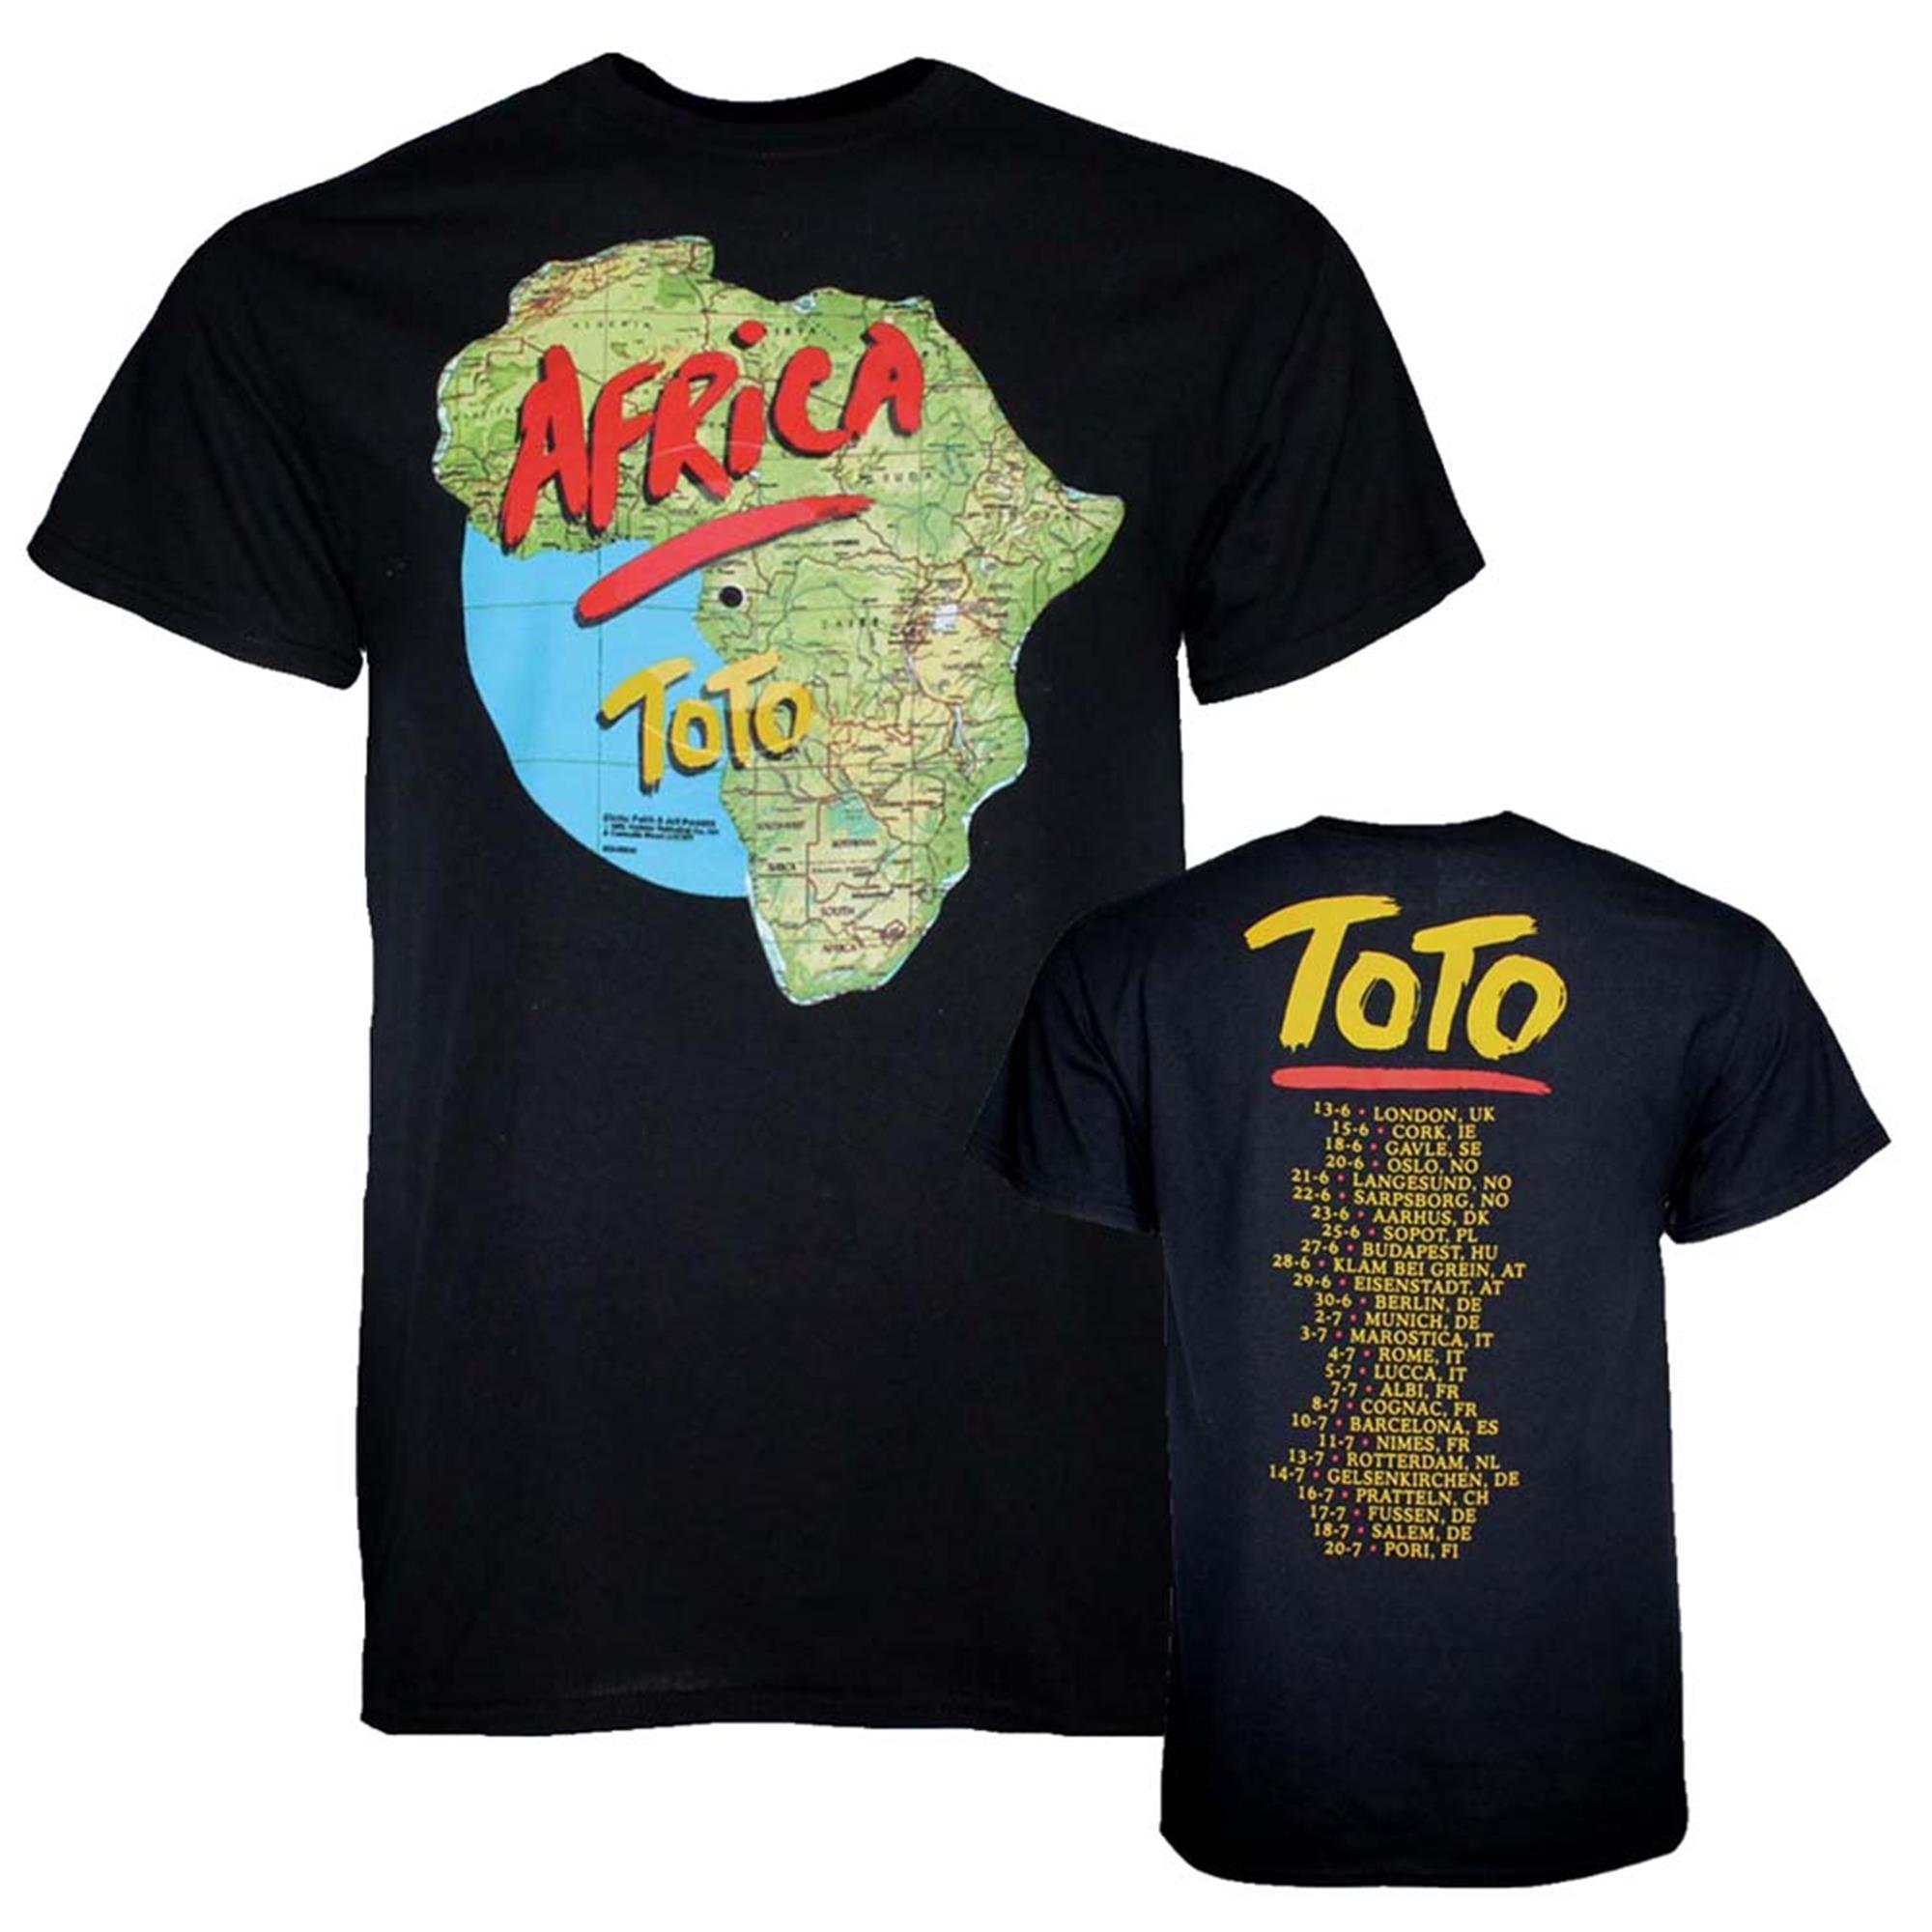 Toto Africa Tour T-Shirt